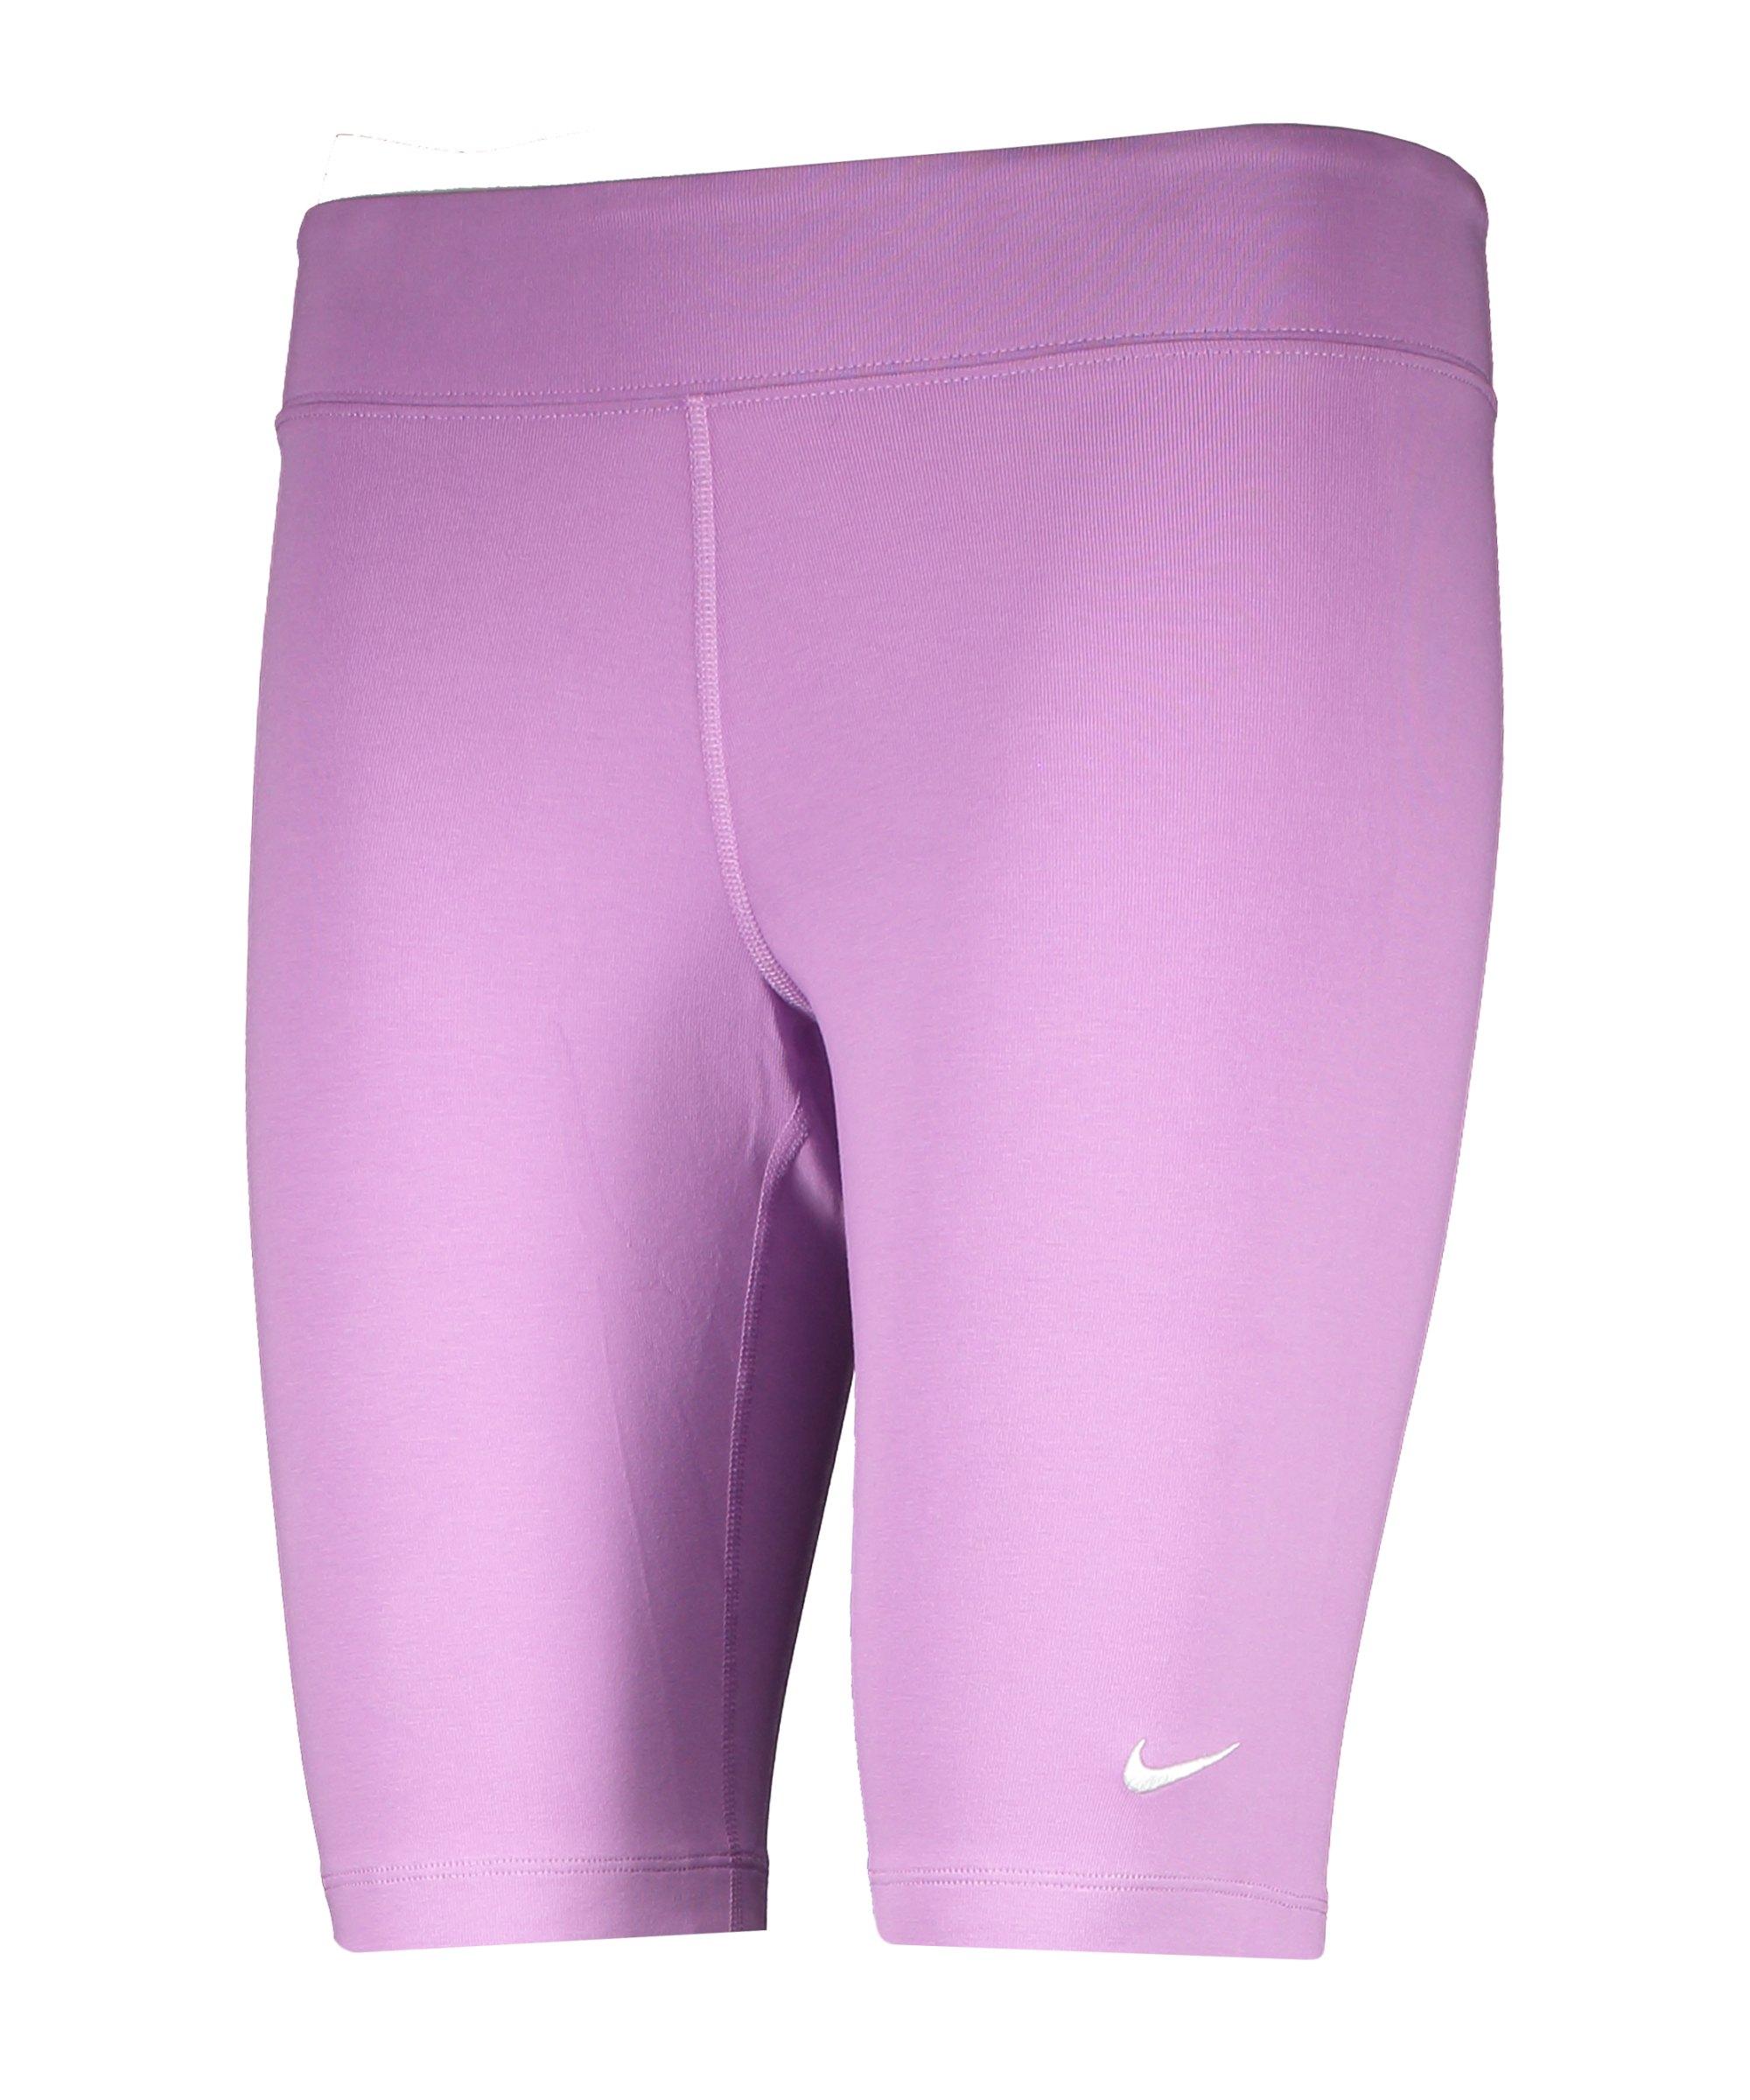 Nike Essential Biker Short Damen Lila Weiss F591 - lila